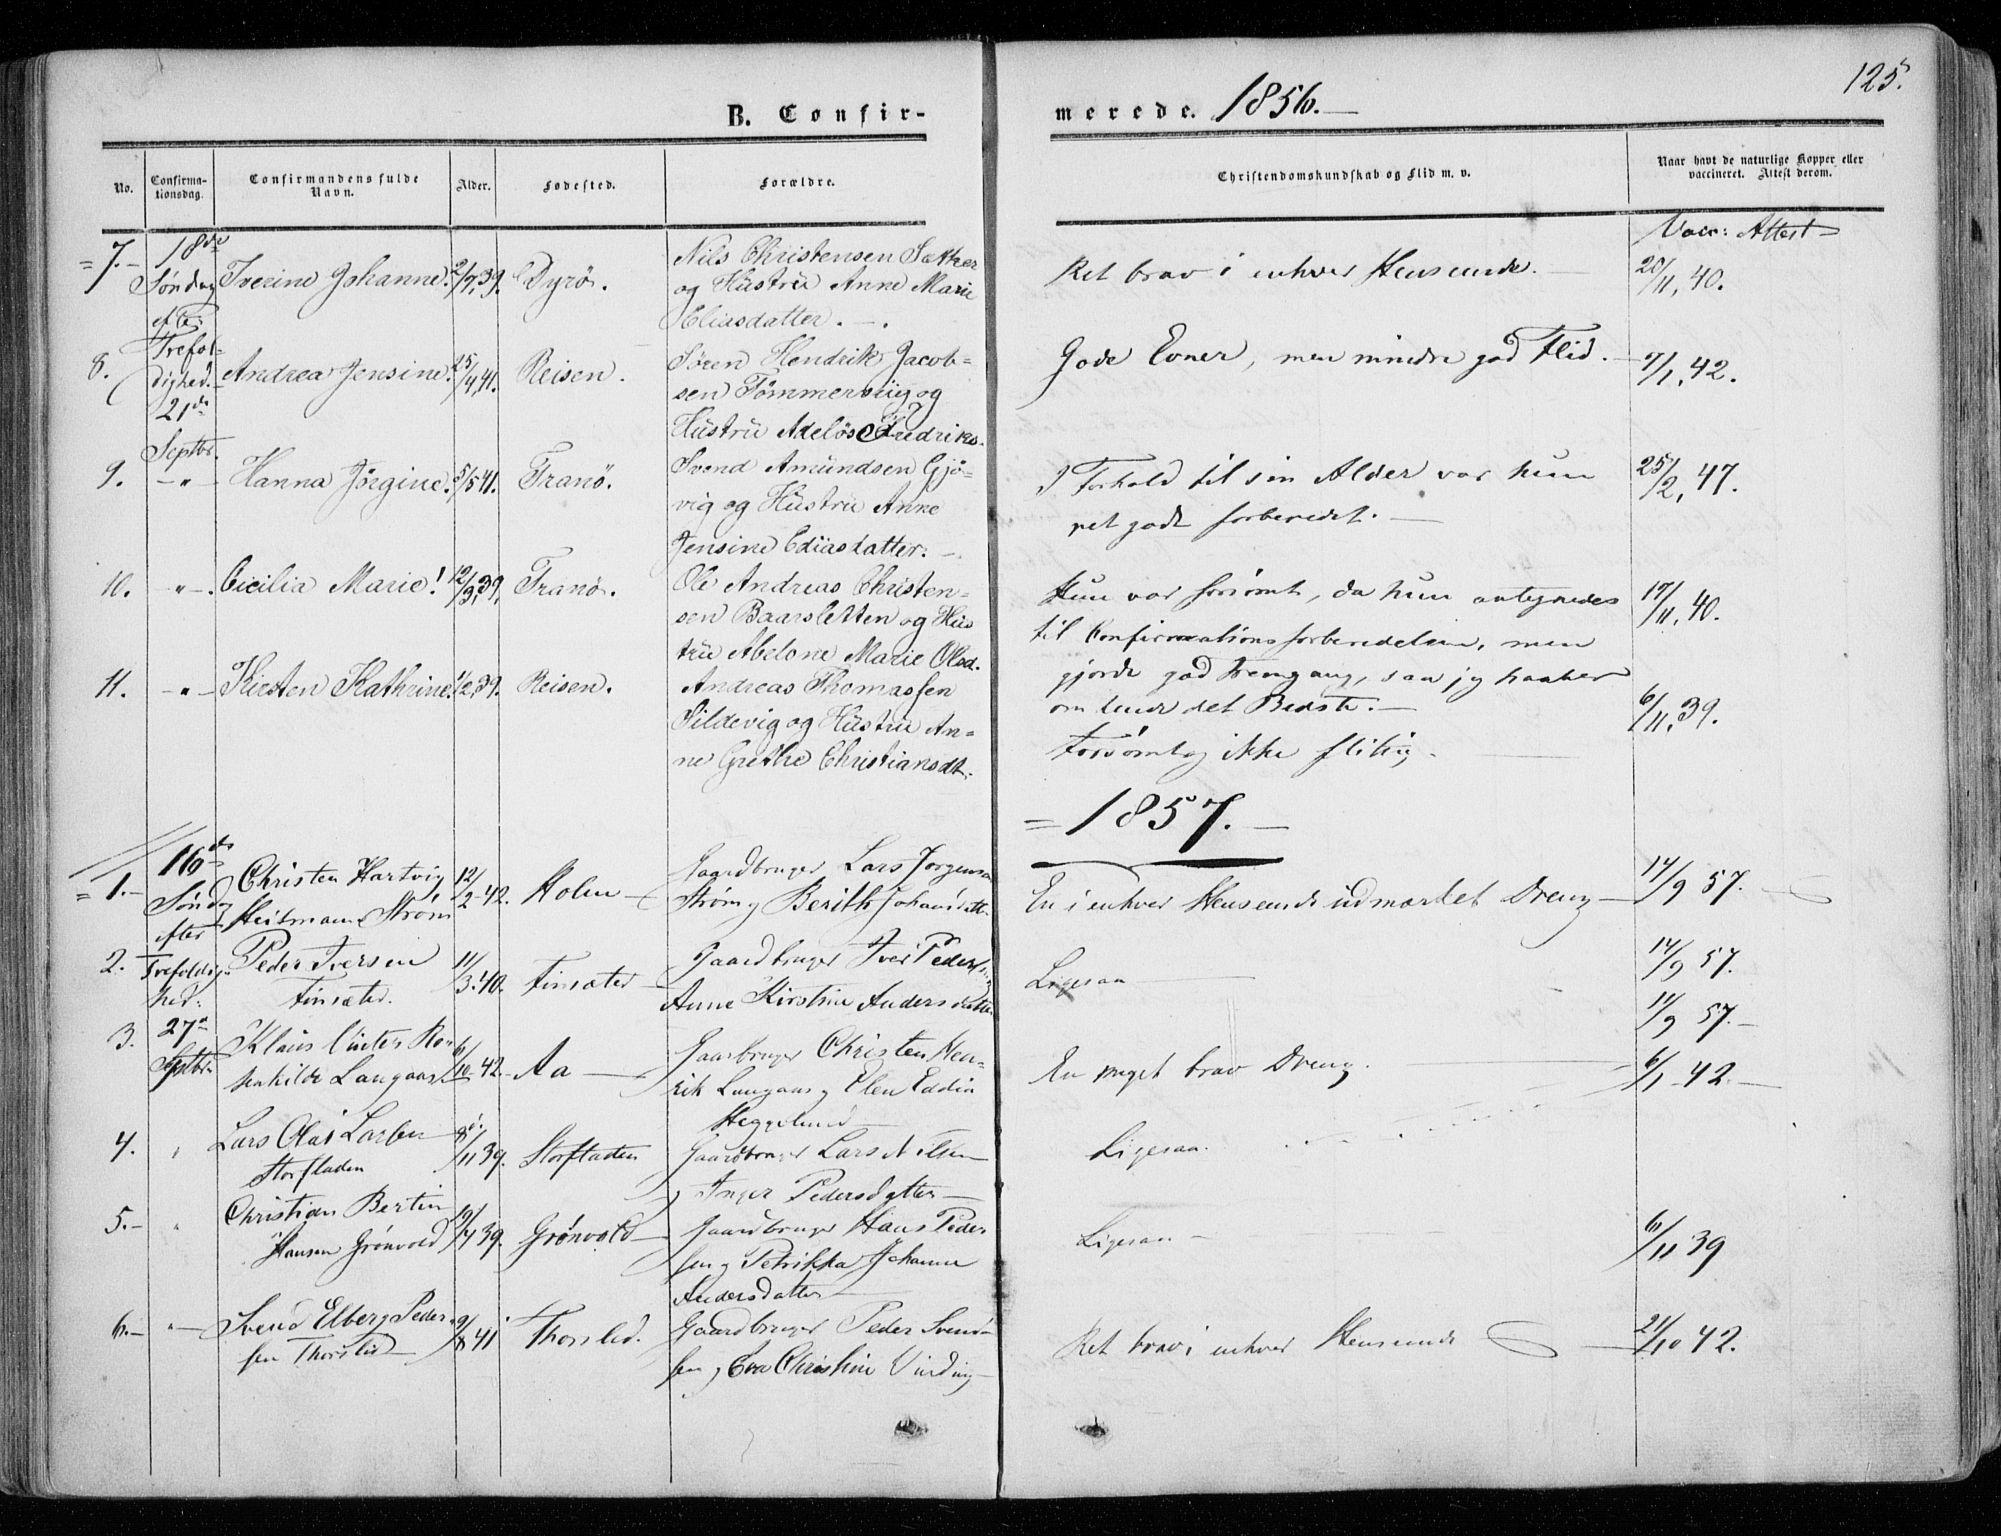 SATØ, Tranøy sokneprestkontor, I/Ia/Iaa/L0007kirke: Ministerialbok nr. 7, 1856-1866, s. 125